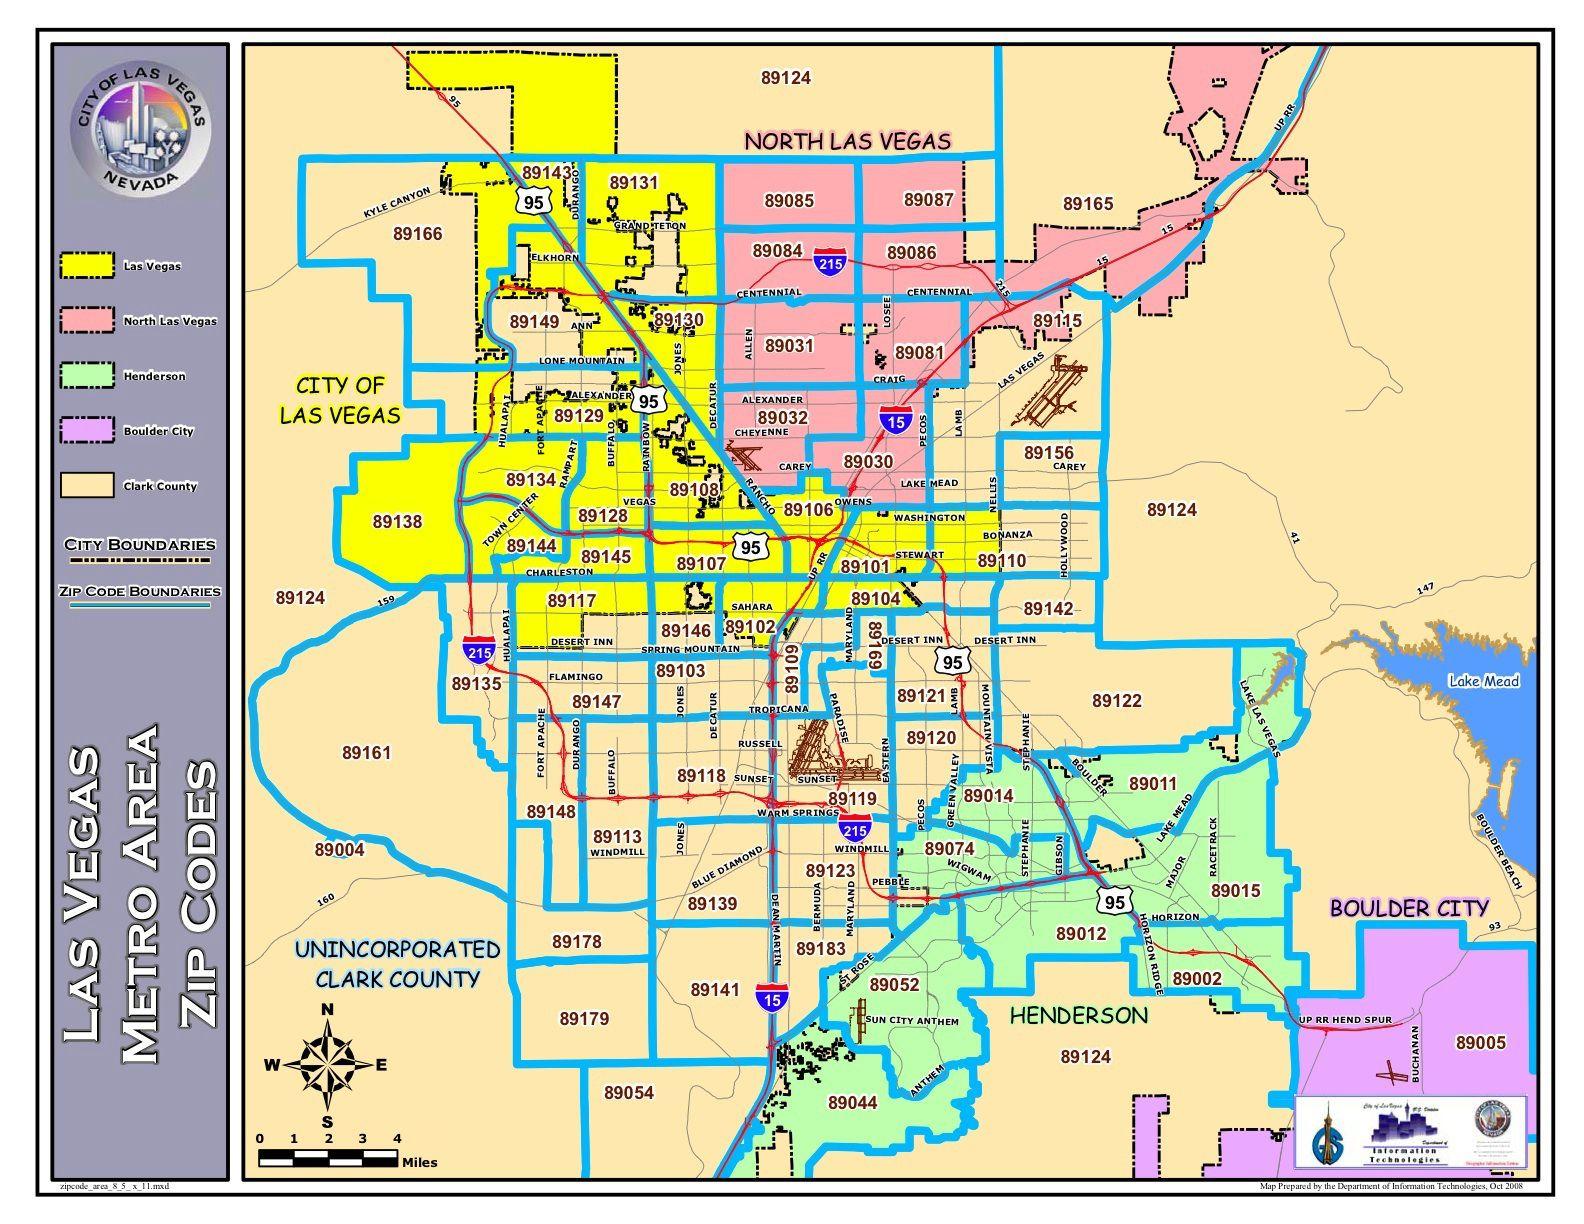 Las Vegas Zip Code Map Showing Information Las Vegas North Las Vegas Boulder City And Henderson With Images Las Vegas Map Vegas Maps